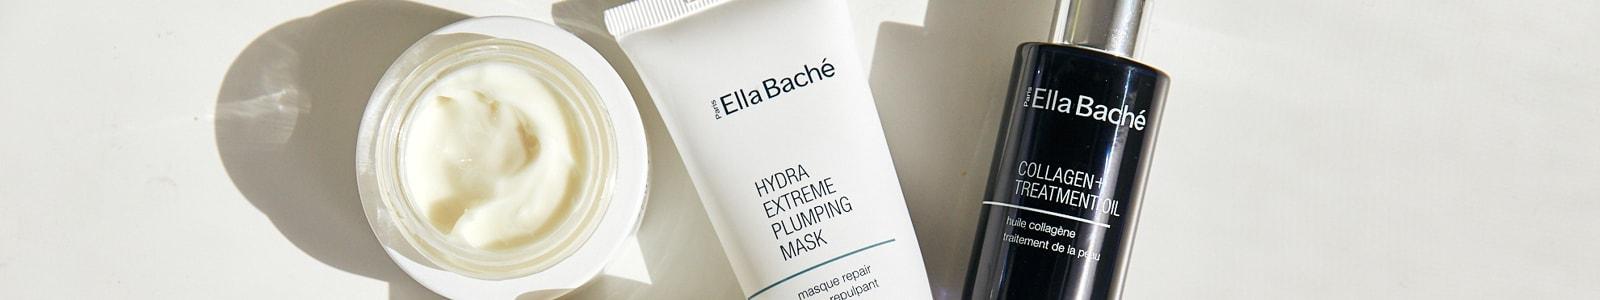 Ella Baché's banner